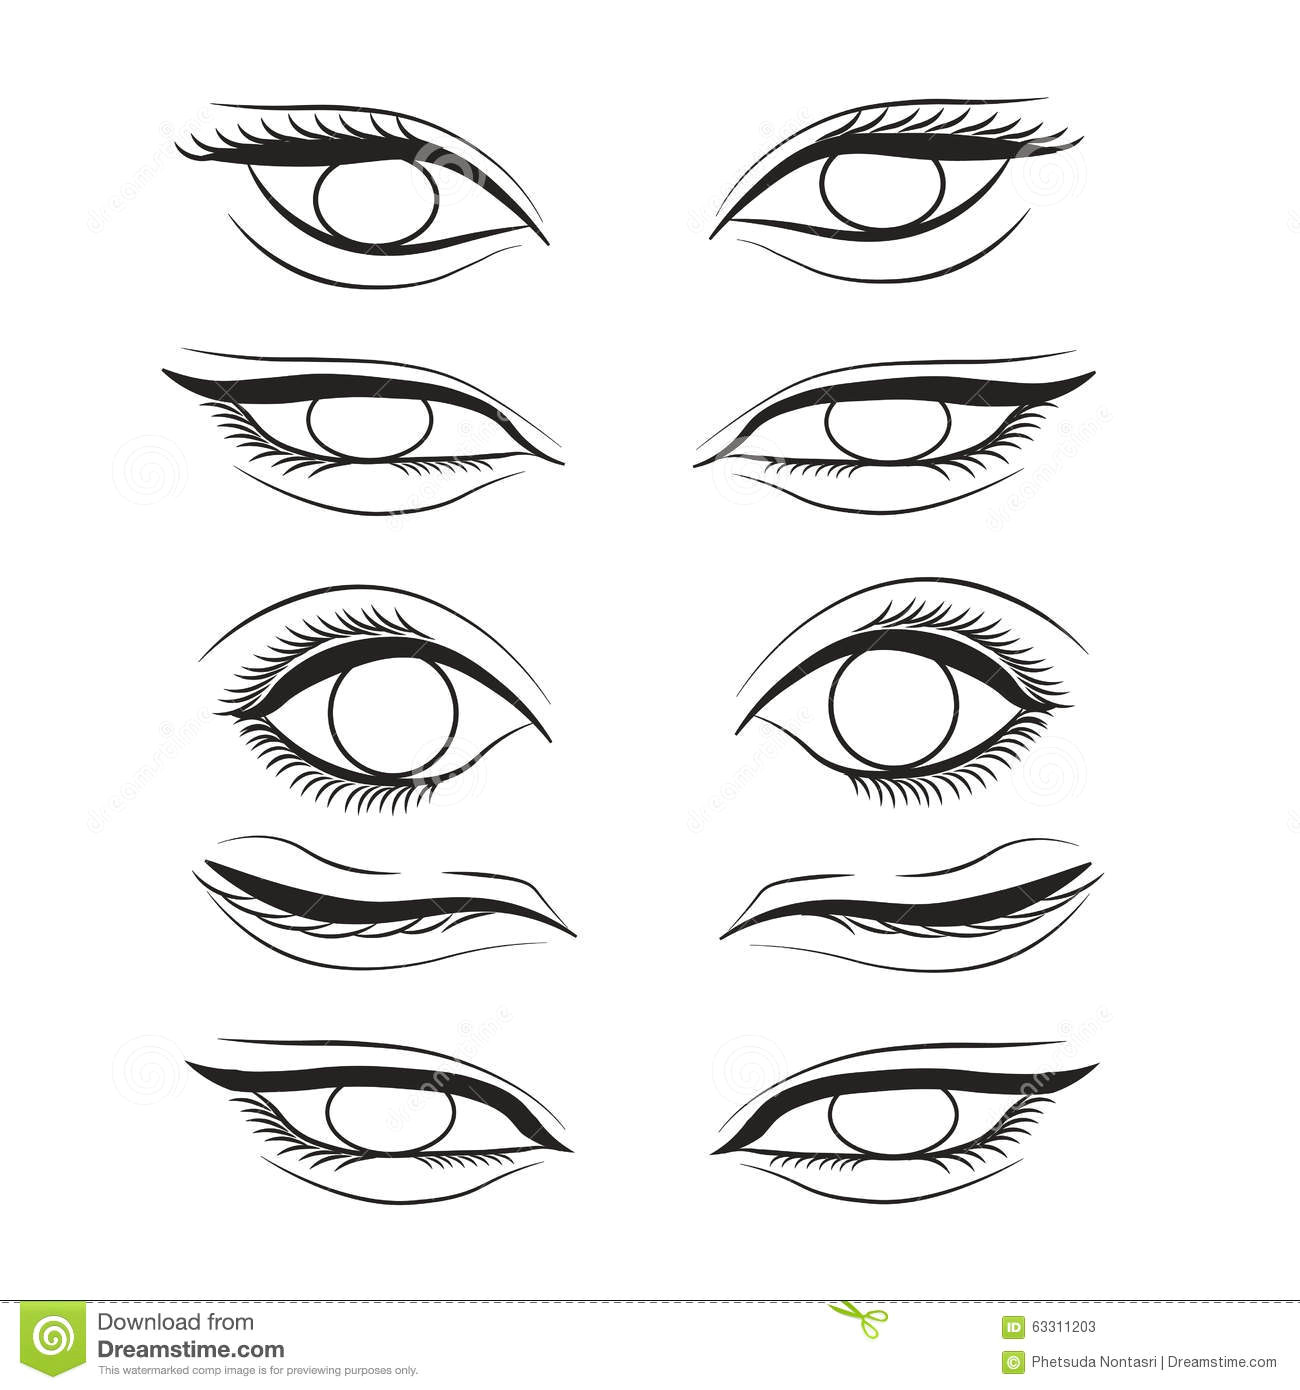 eye cartoon line sketch shape design abstract illustration